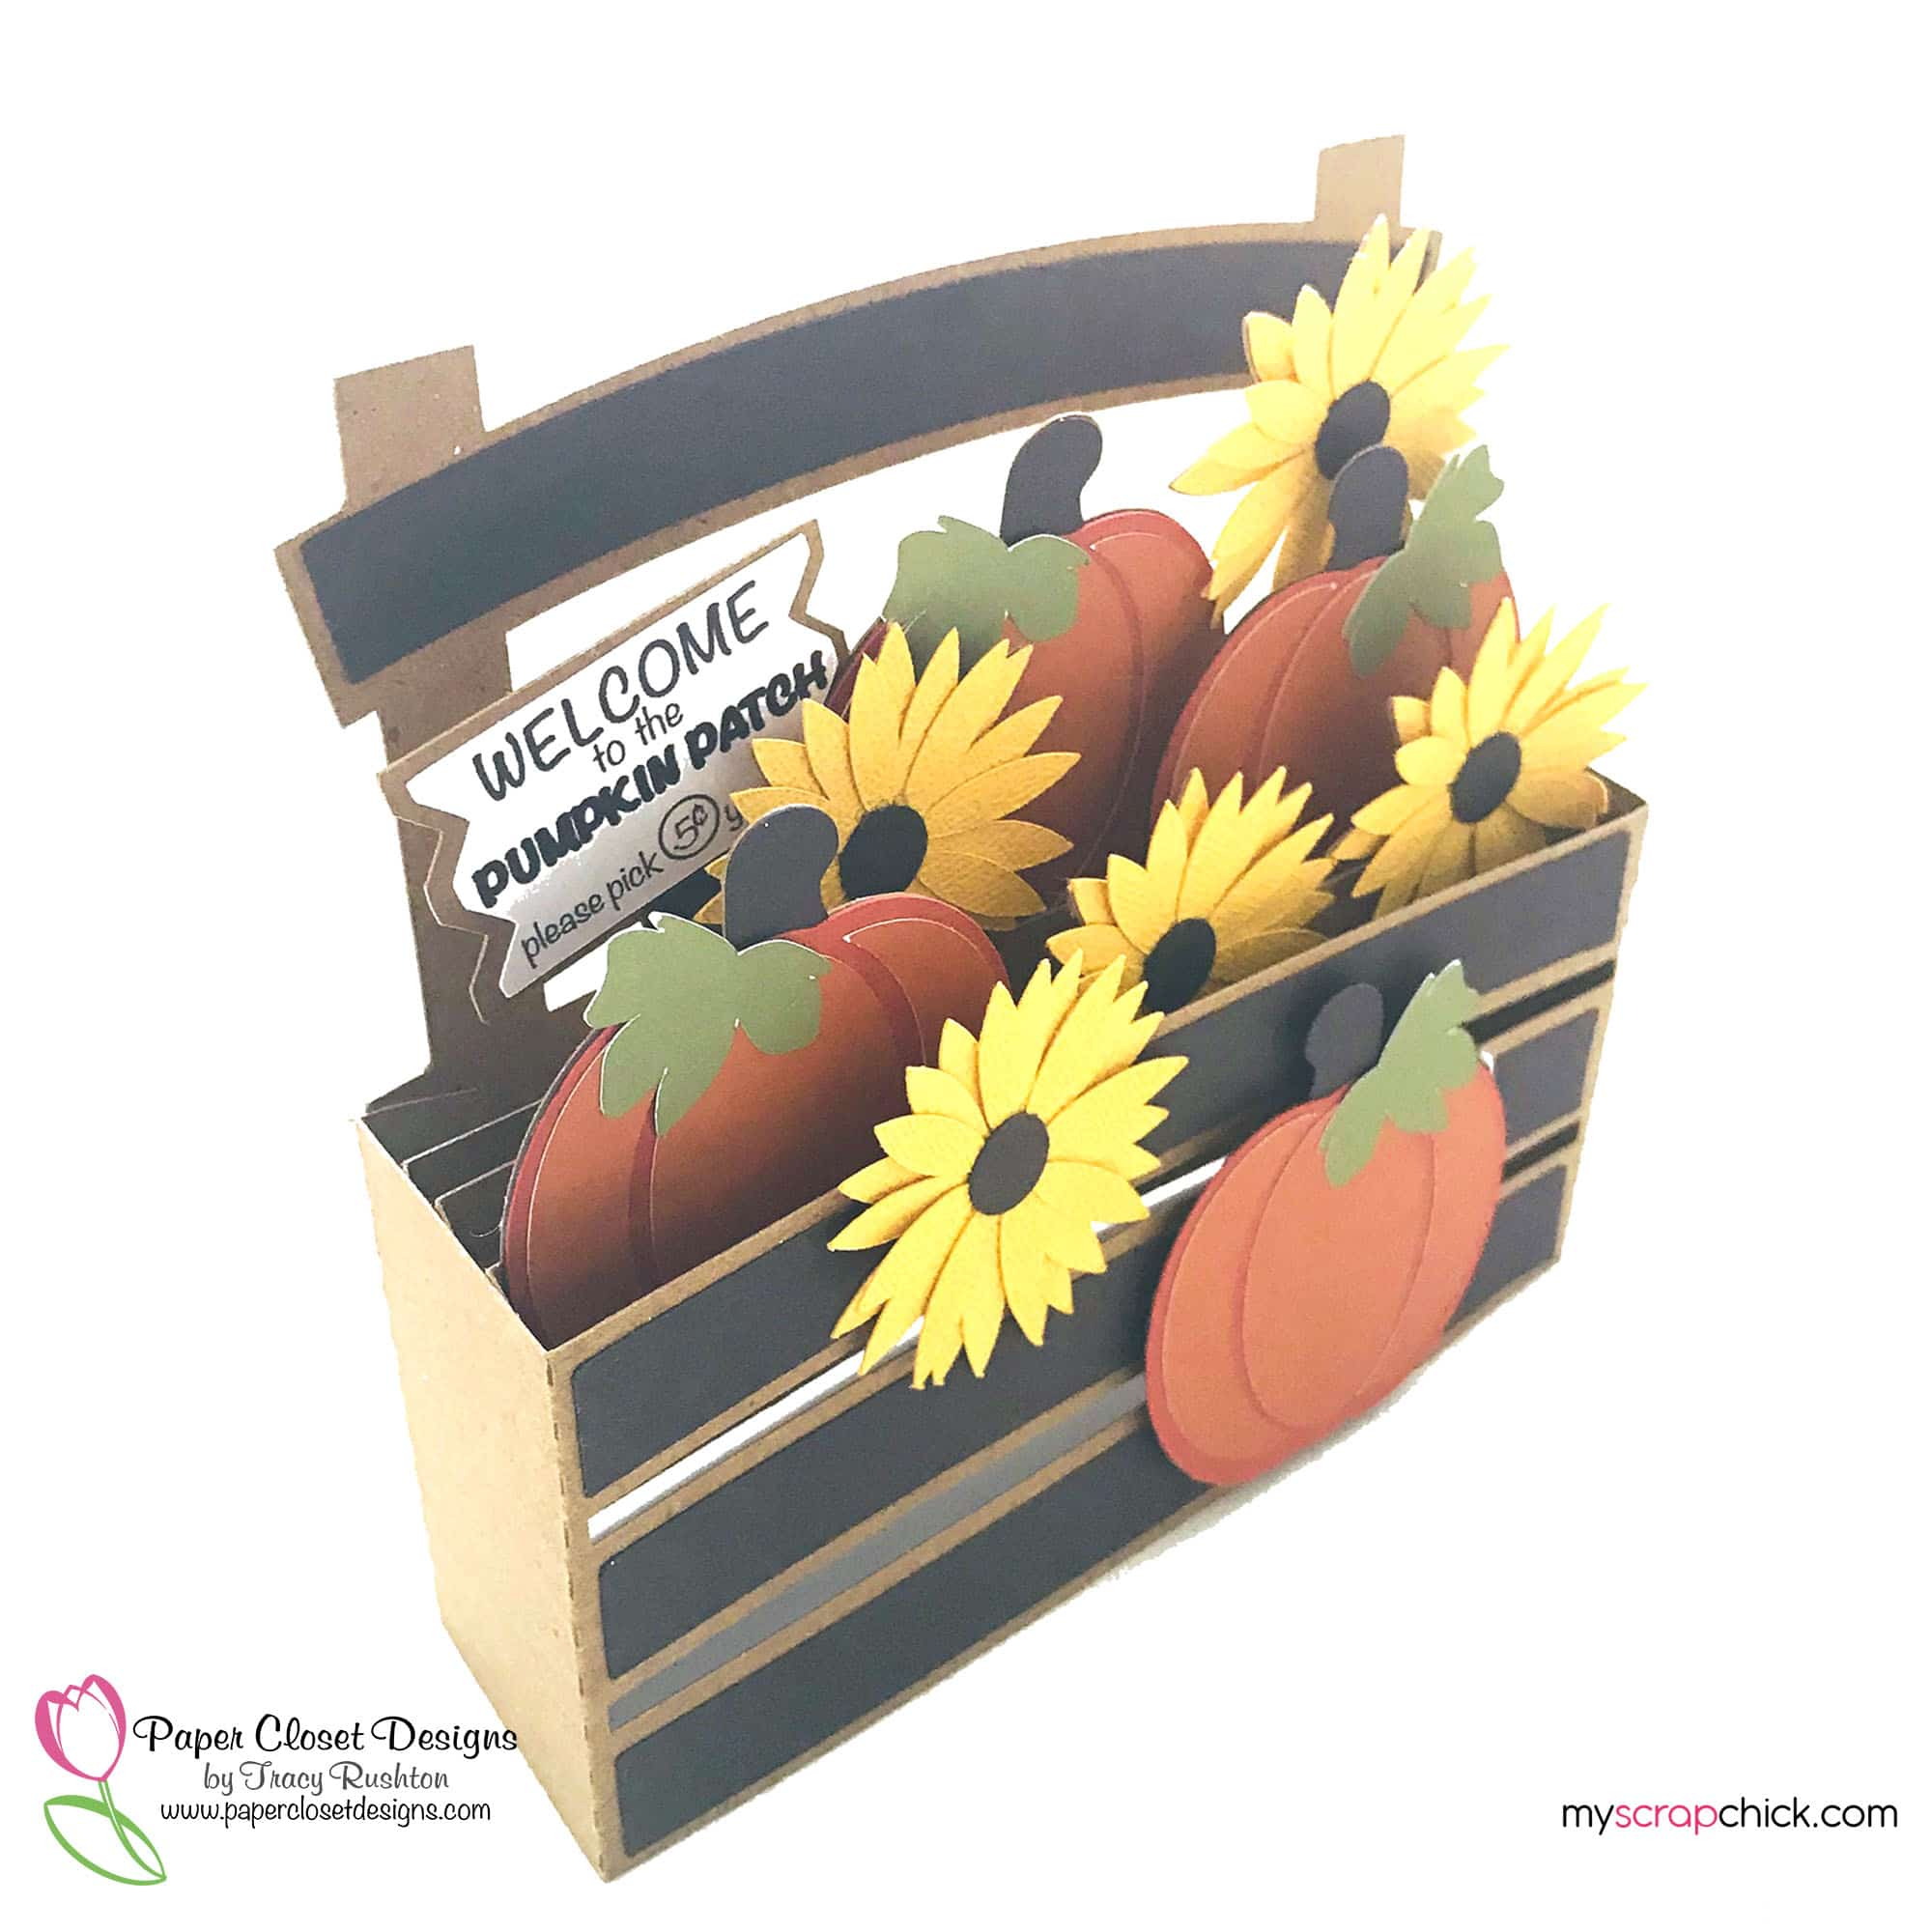 Pumpkin patch Box Card side view